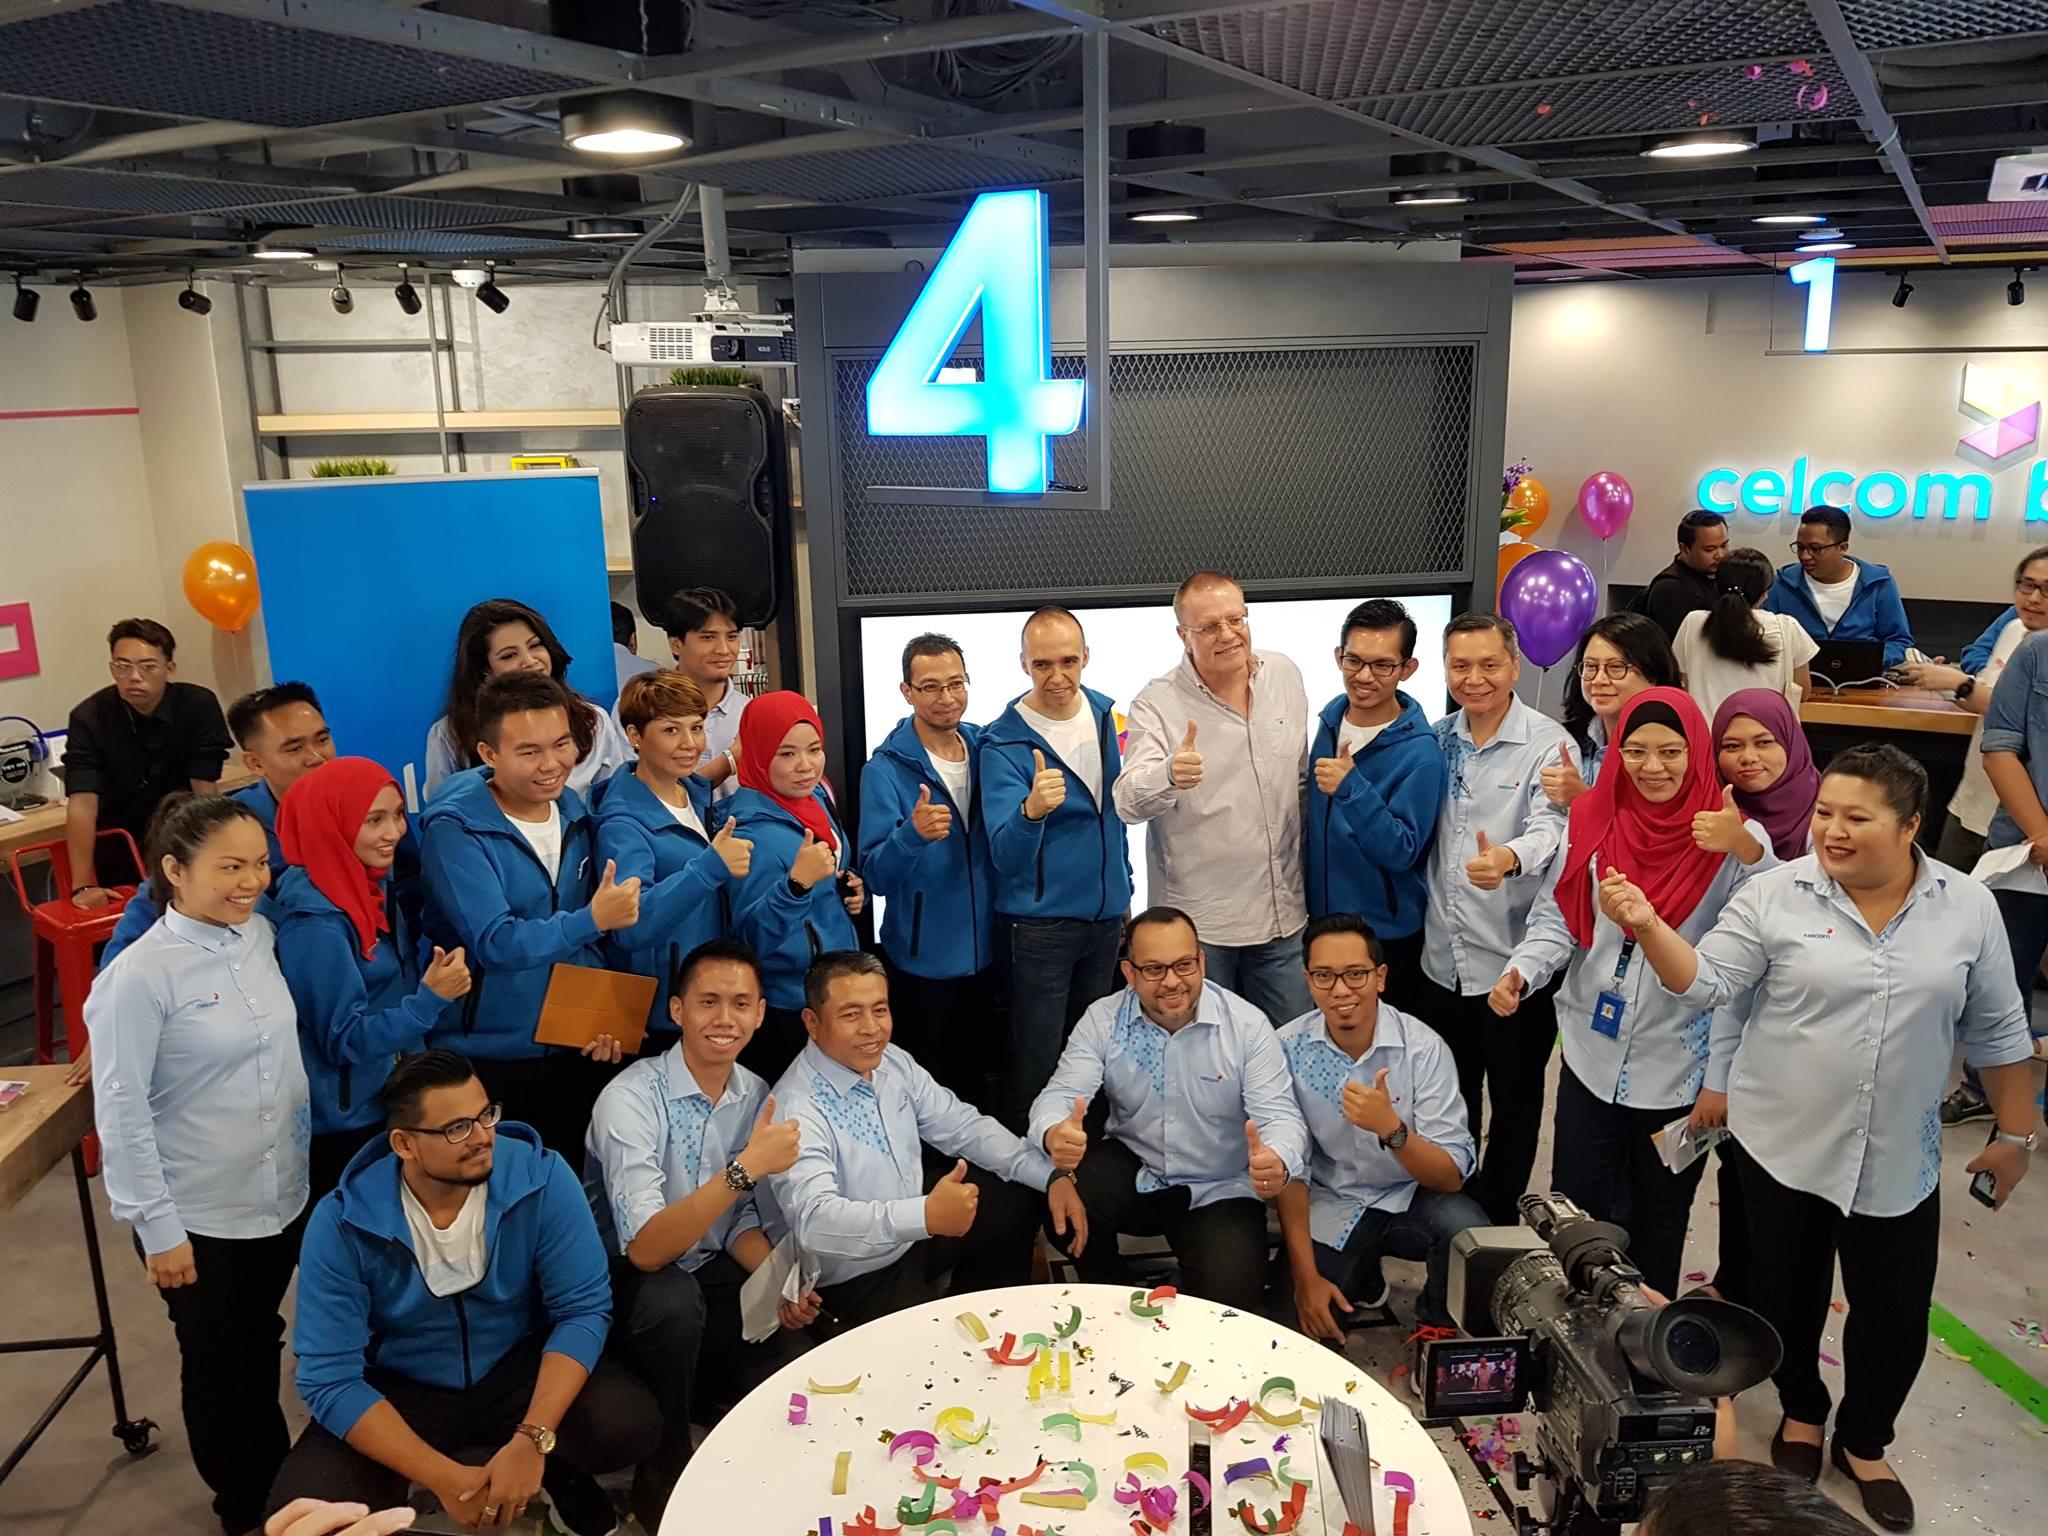 Celcom Cheras Blue Cube获全面翻新,2018年将普及至全马61家Blue Cube!